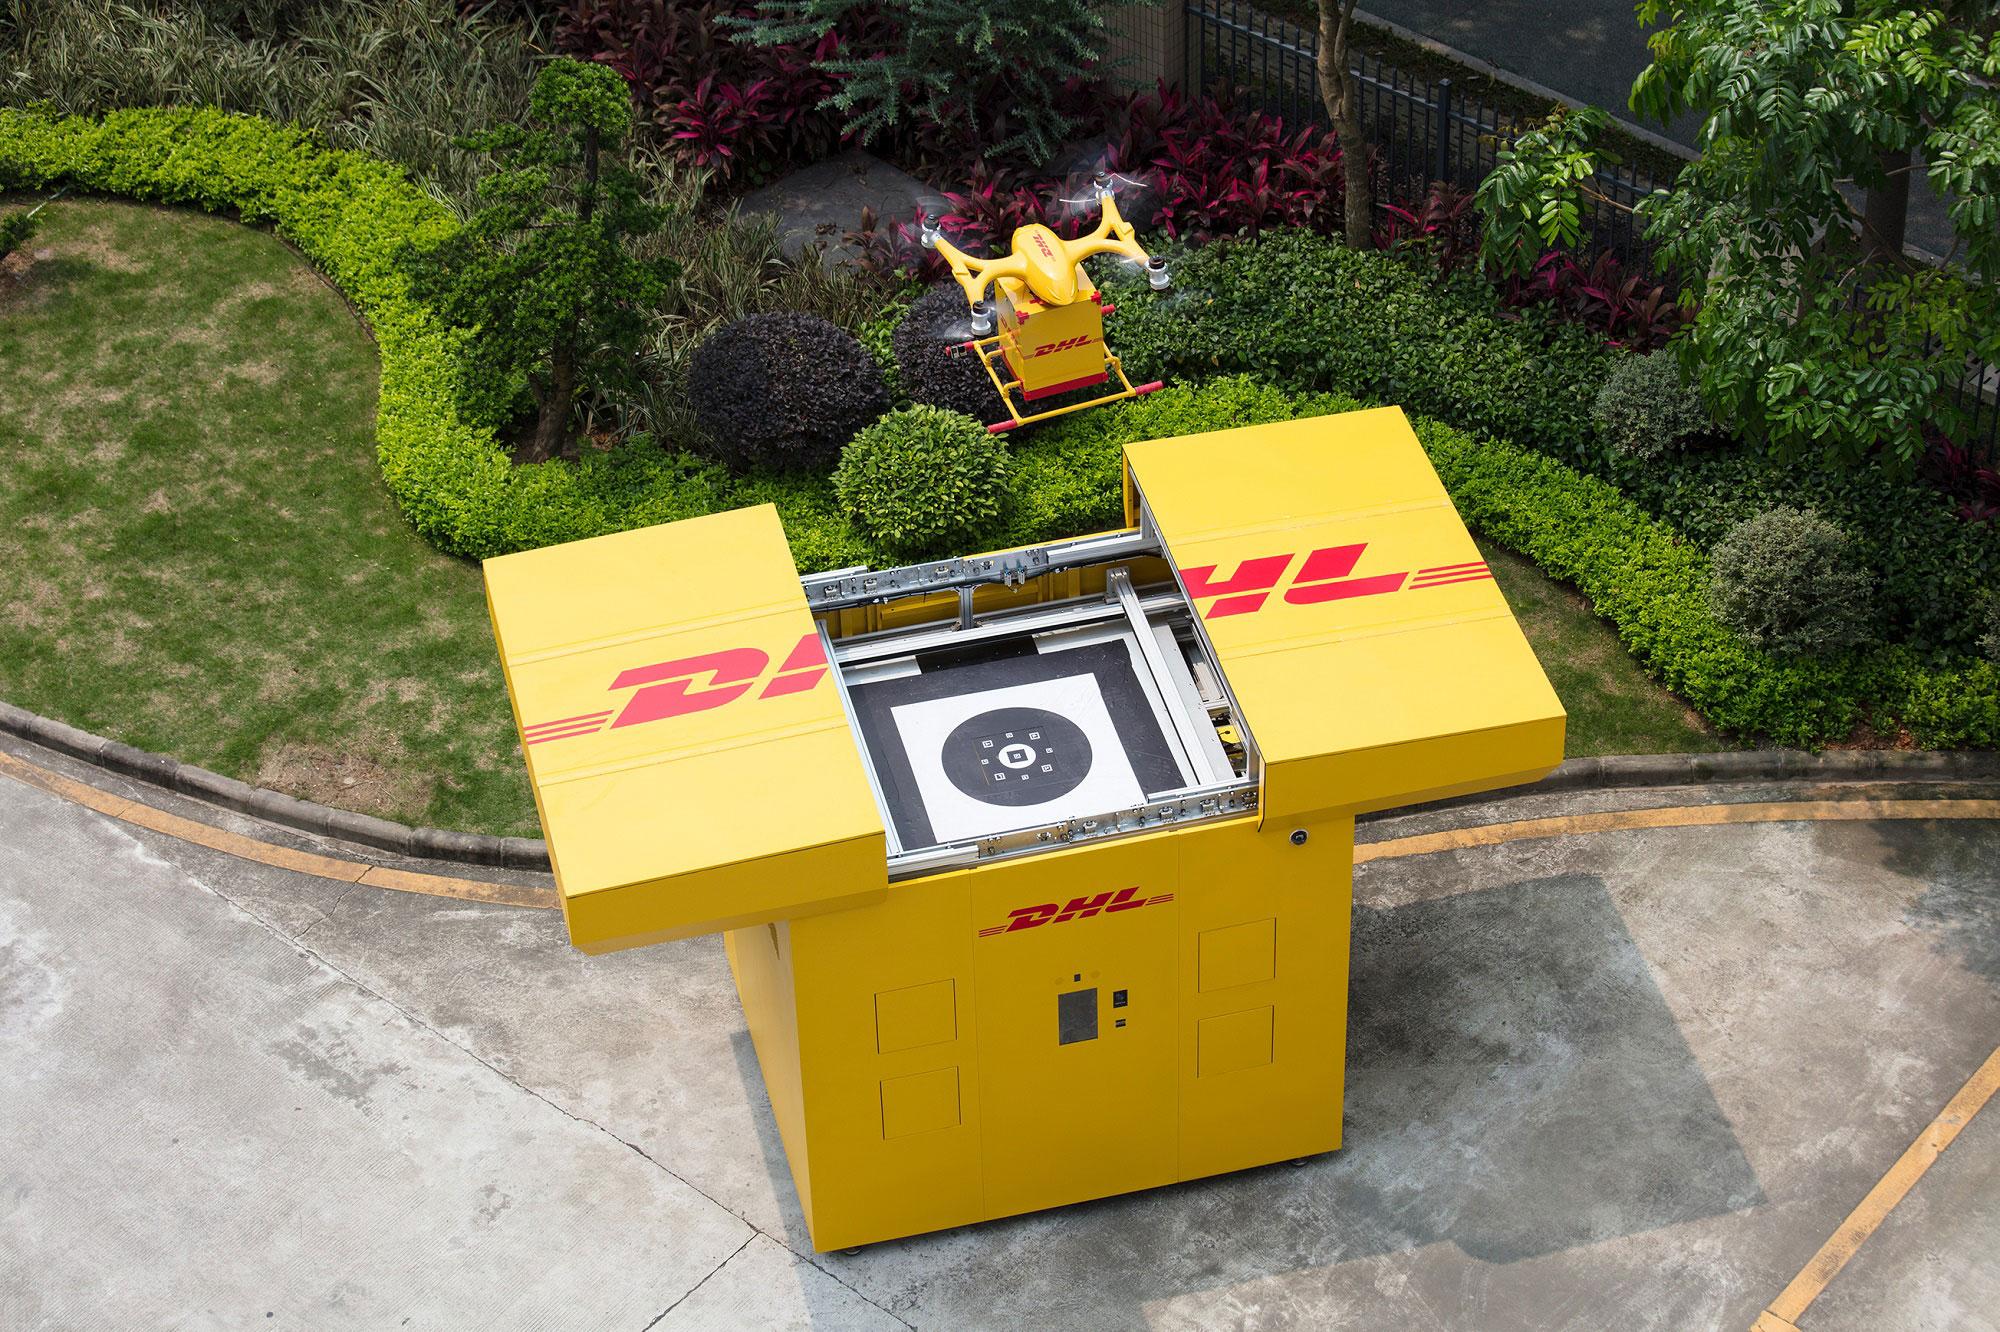 dhl-ekspress-drone-hizmeti-001.jpg